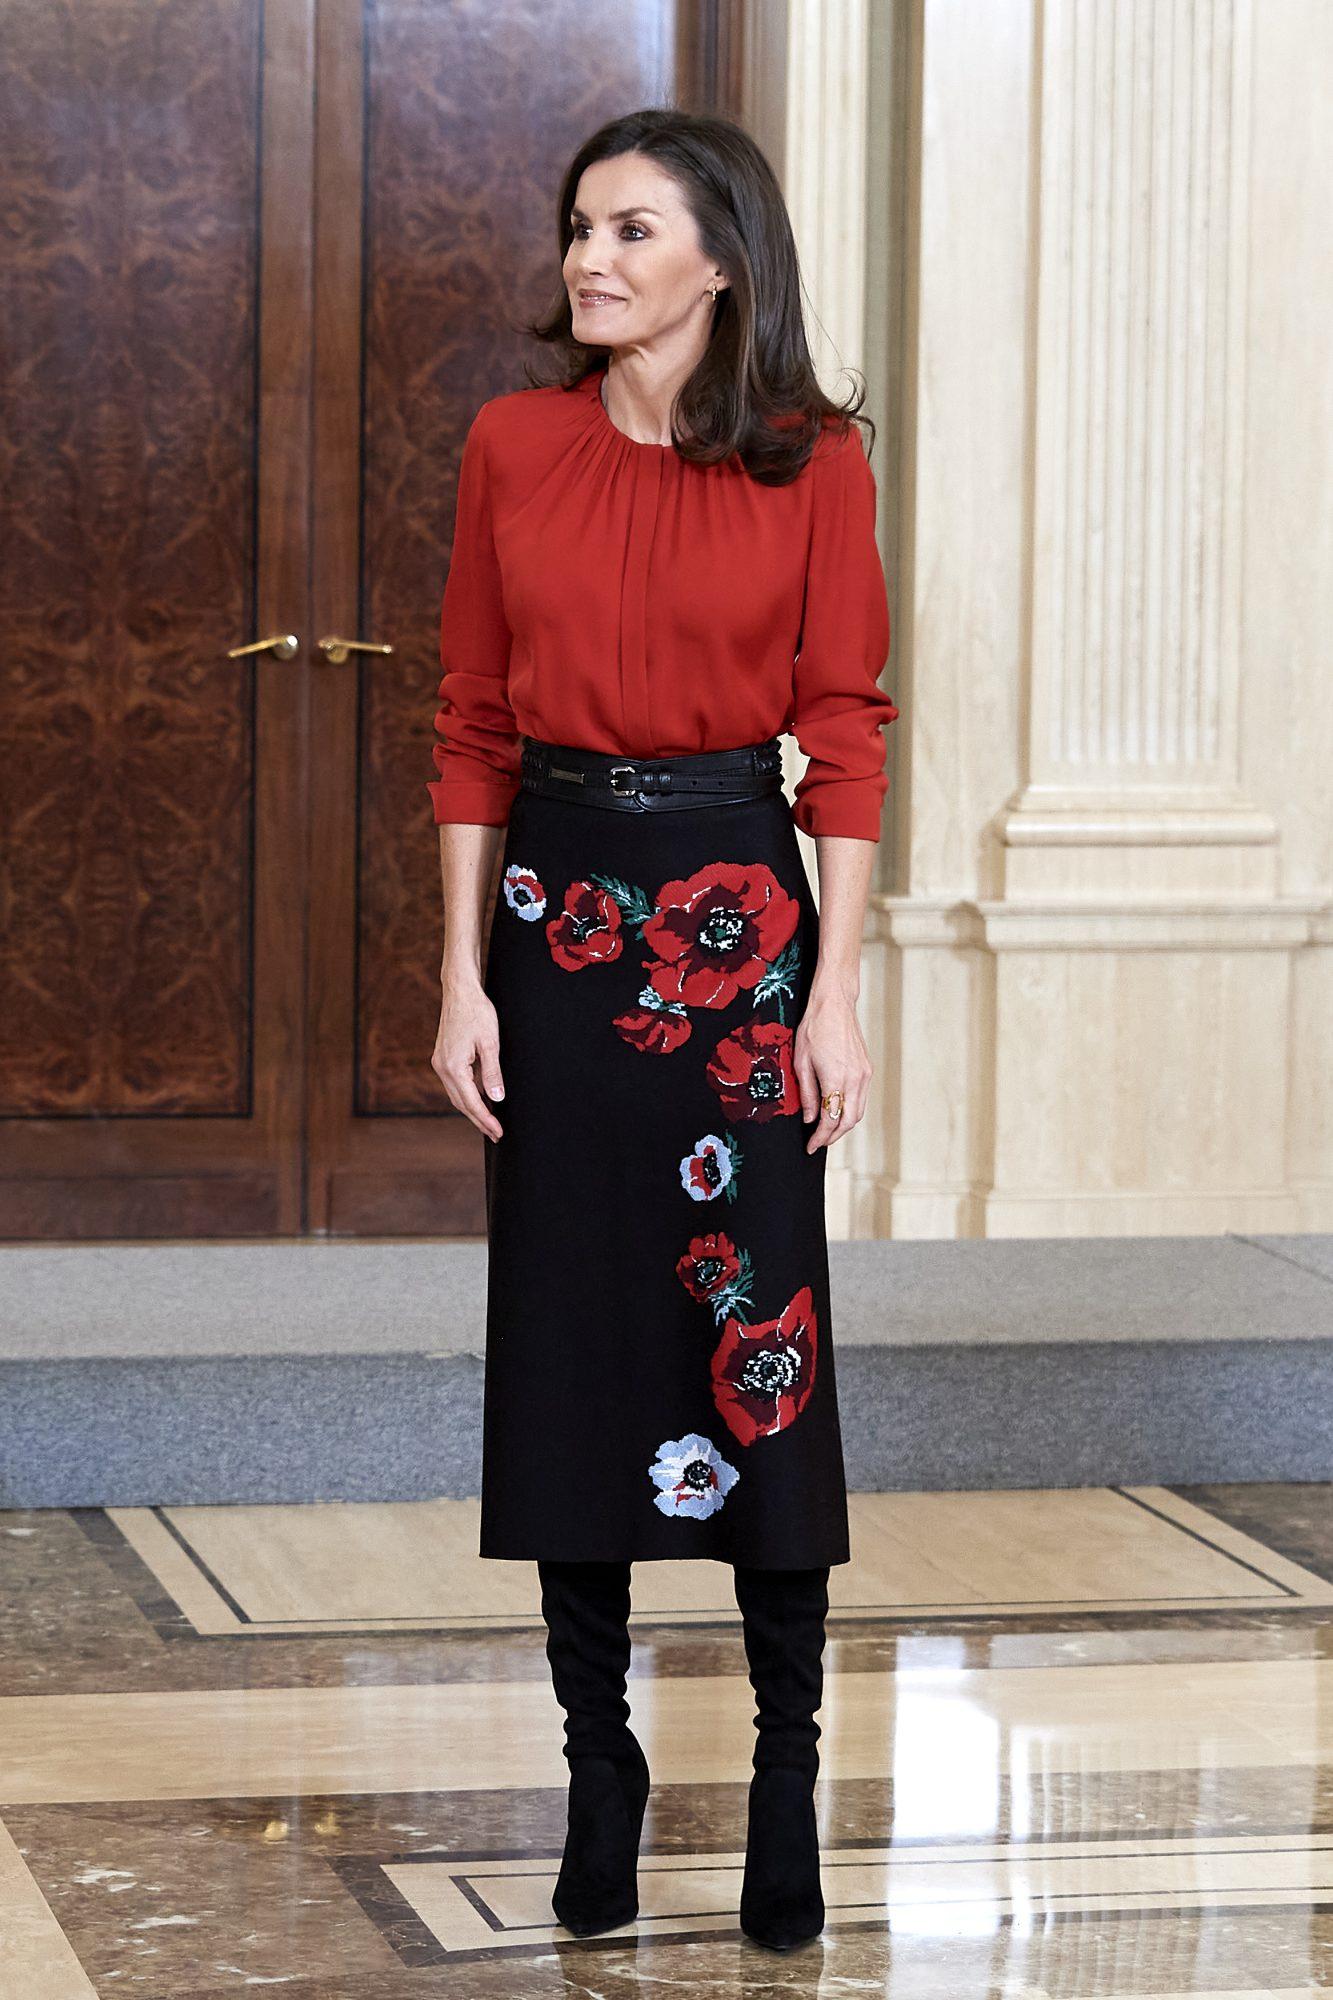 La reina Letizia, looks